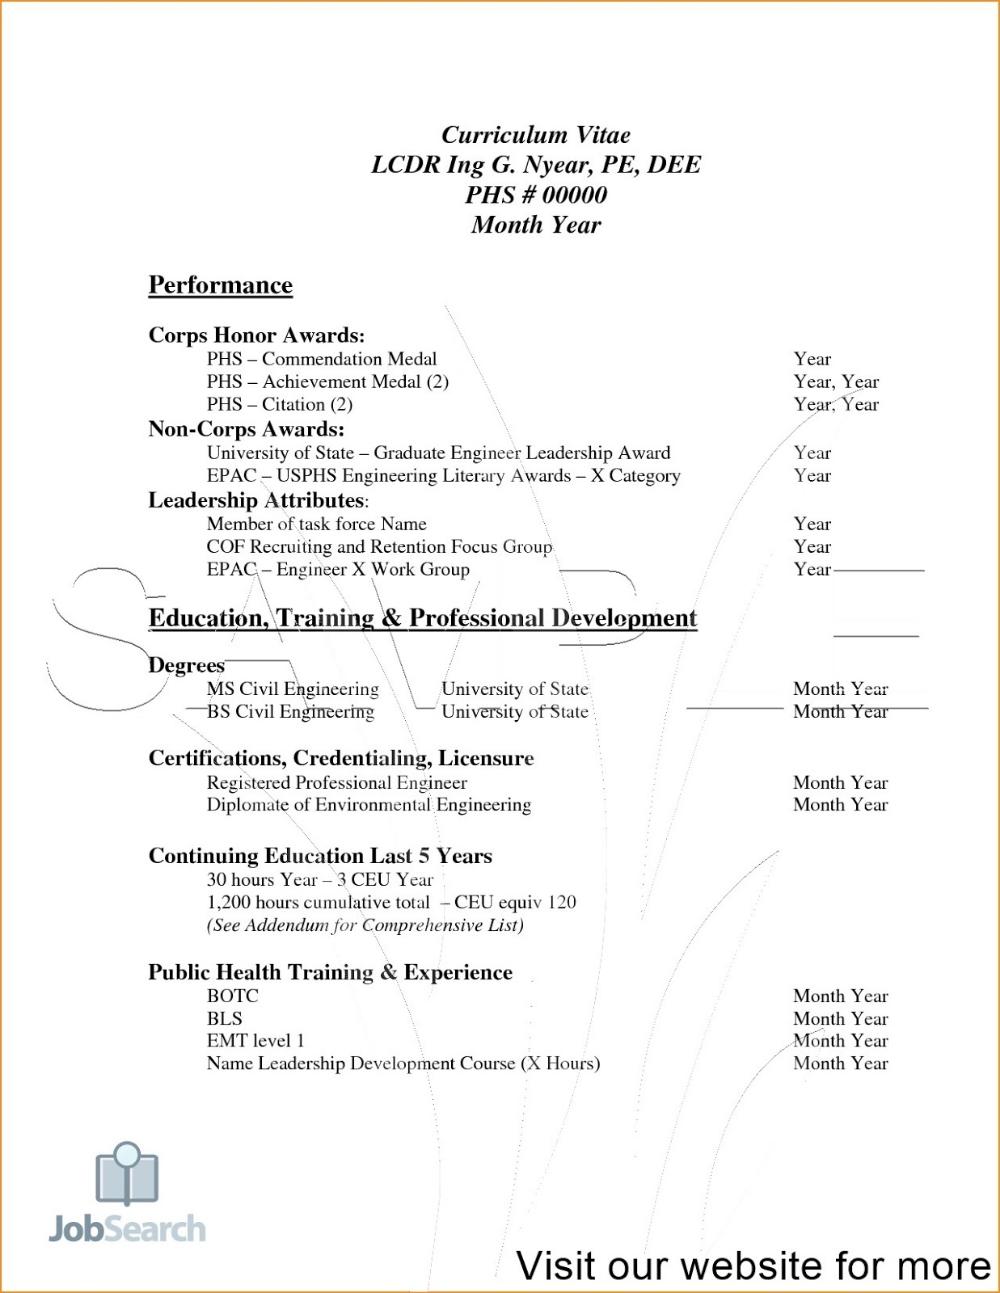 Job Resume PDF 2020 Job Resume for Freshers in 2020